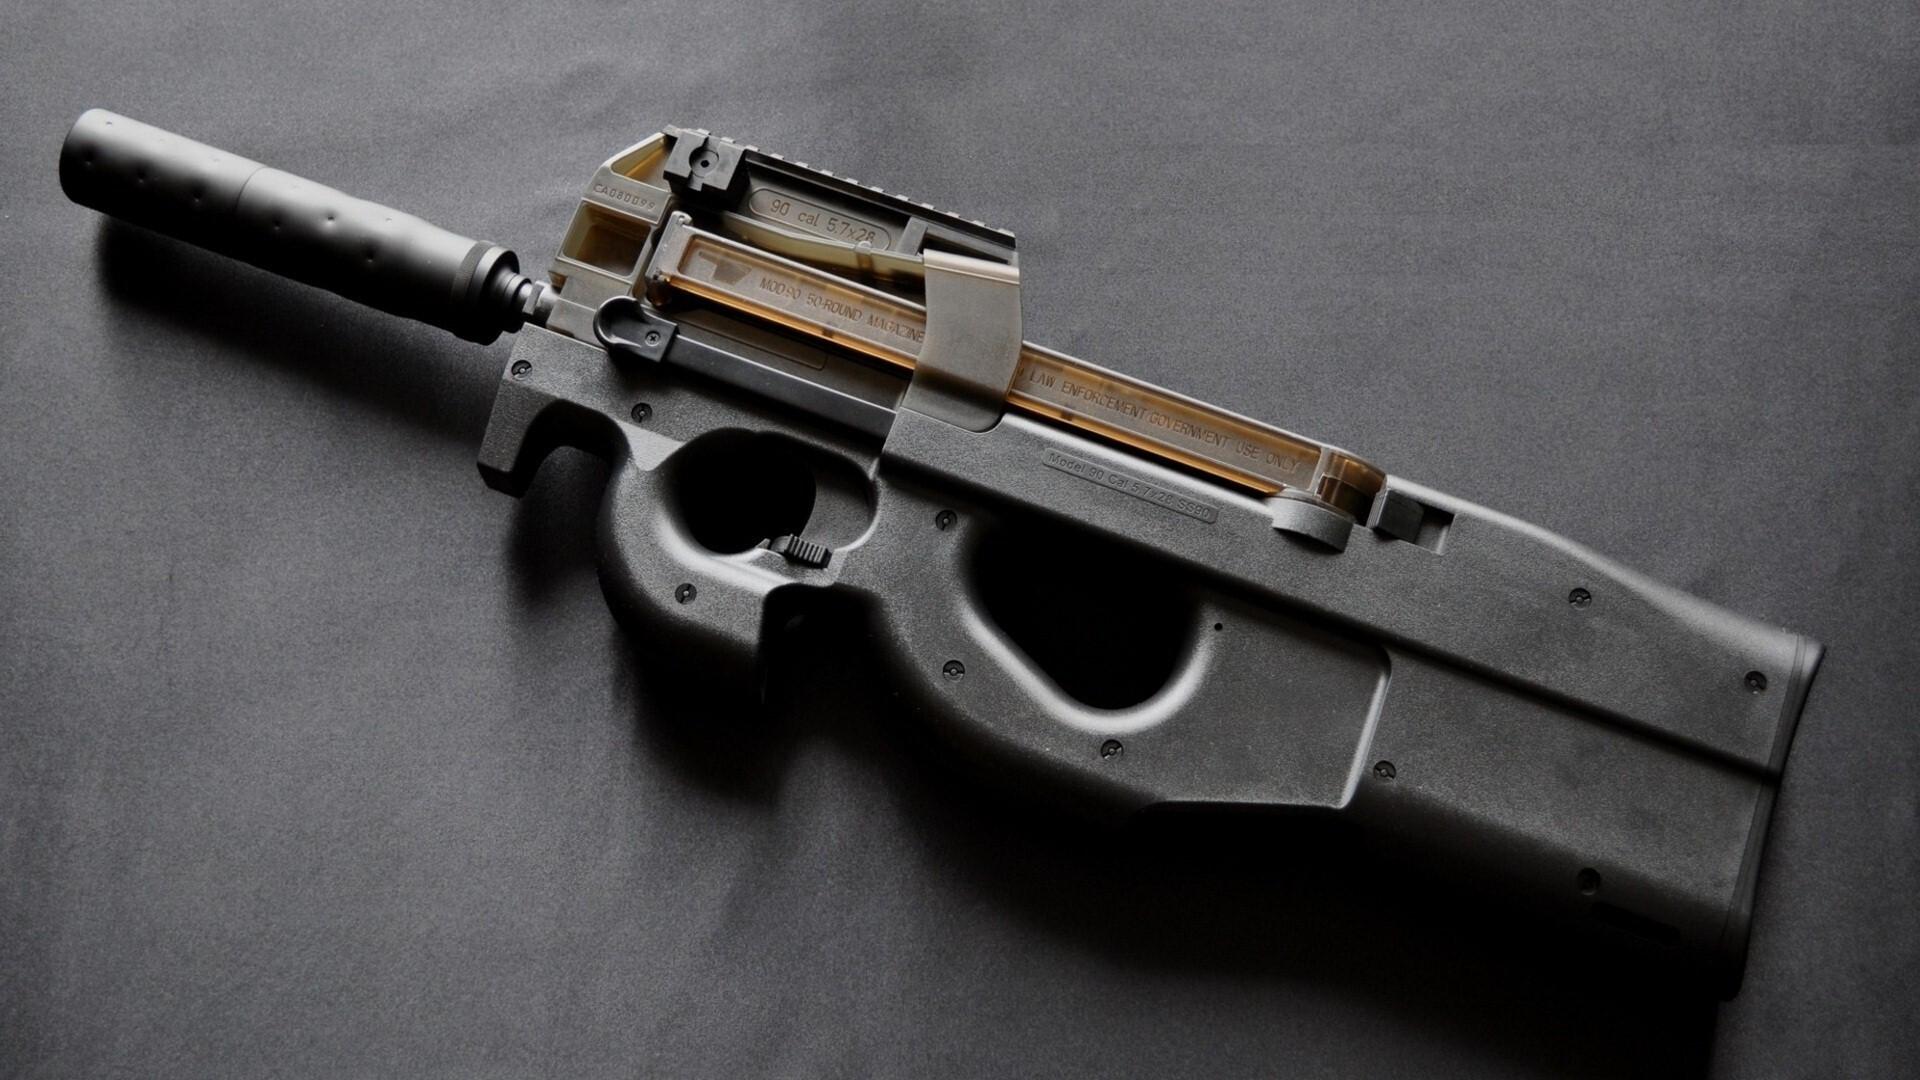 Fn P90 Sub Machine Gun Hd Wallpaper Hd Wallpapers